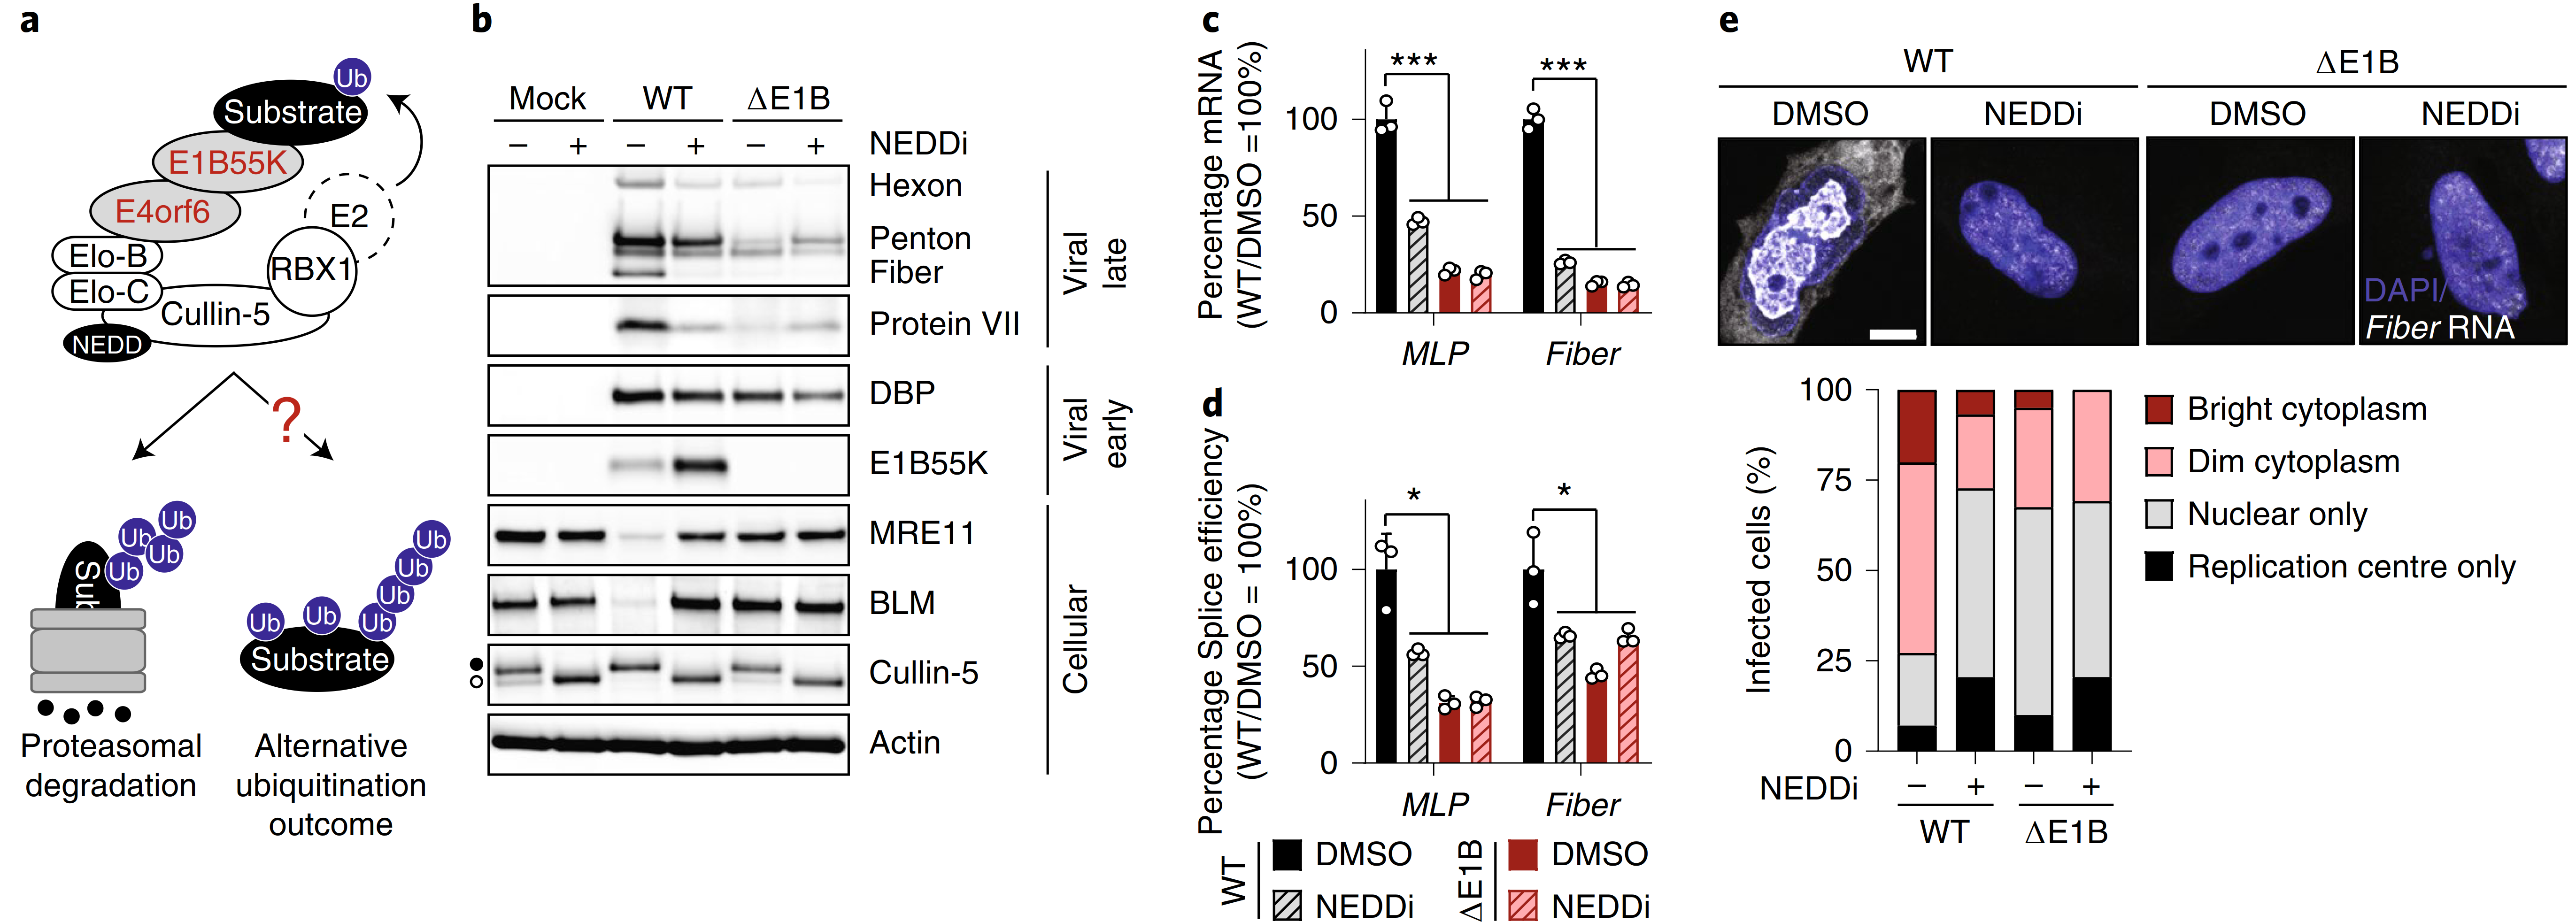 Nature microbiology   腺病毒介导的泛素化改变了蛋白质-RNA的结合和艾滋病毒RNA的加工